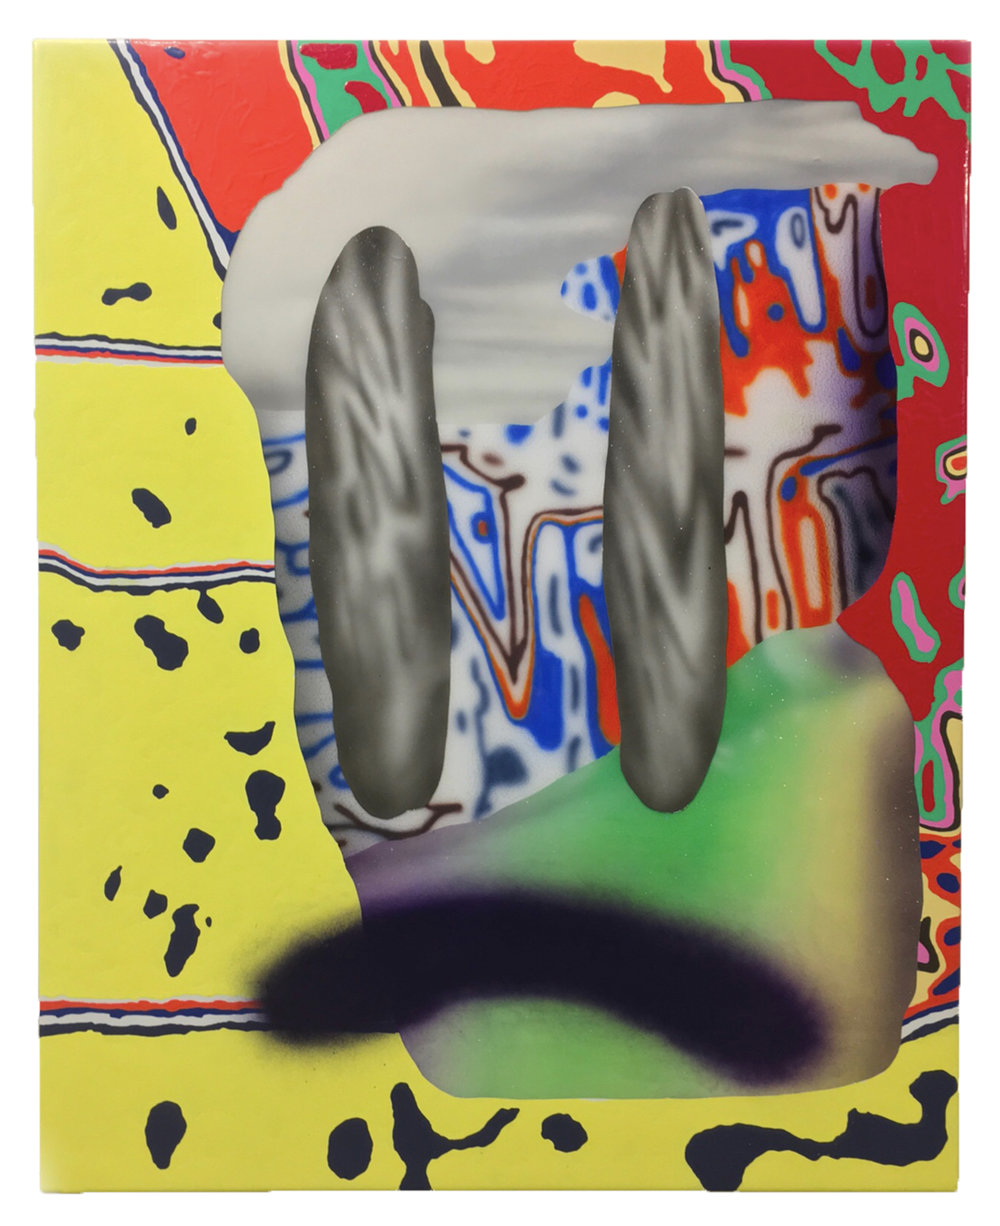 TERRY HOFF    Backeye , 2018  Acrylic, acrylic medium, spray paint, epoxy resin on panel  48 x 38 inches